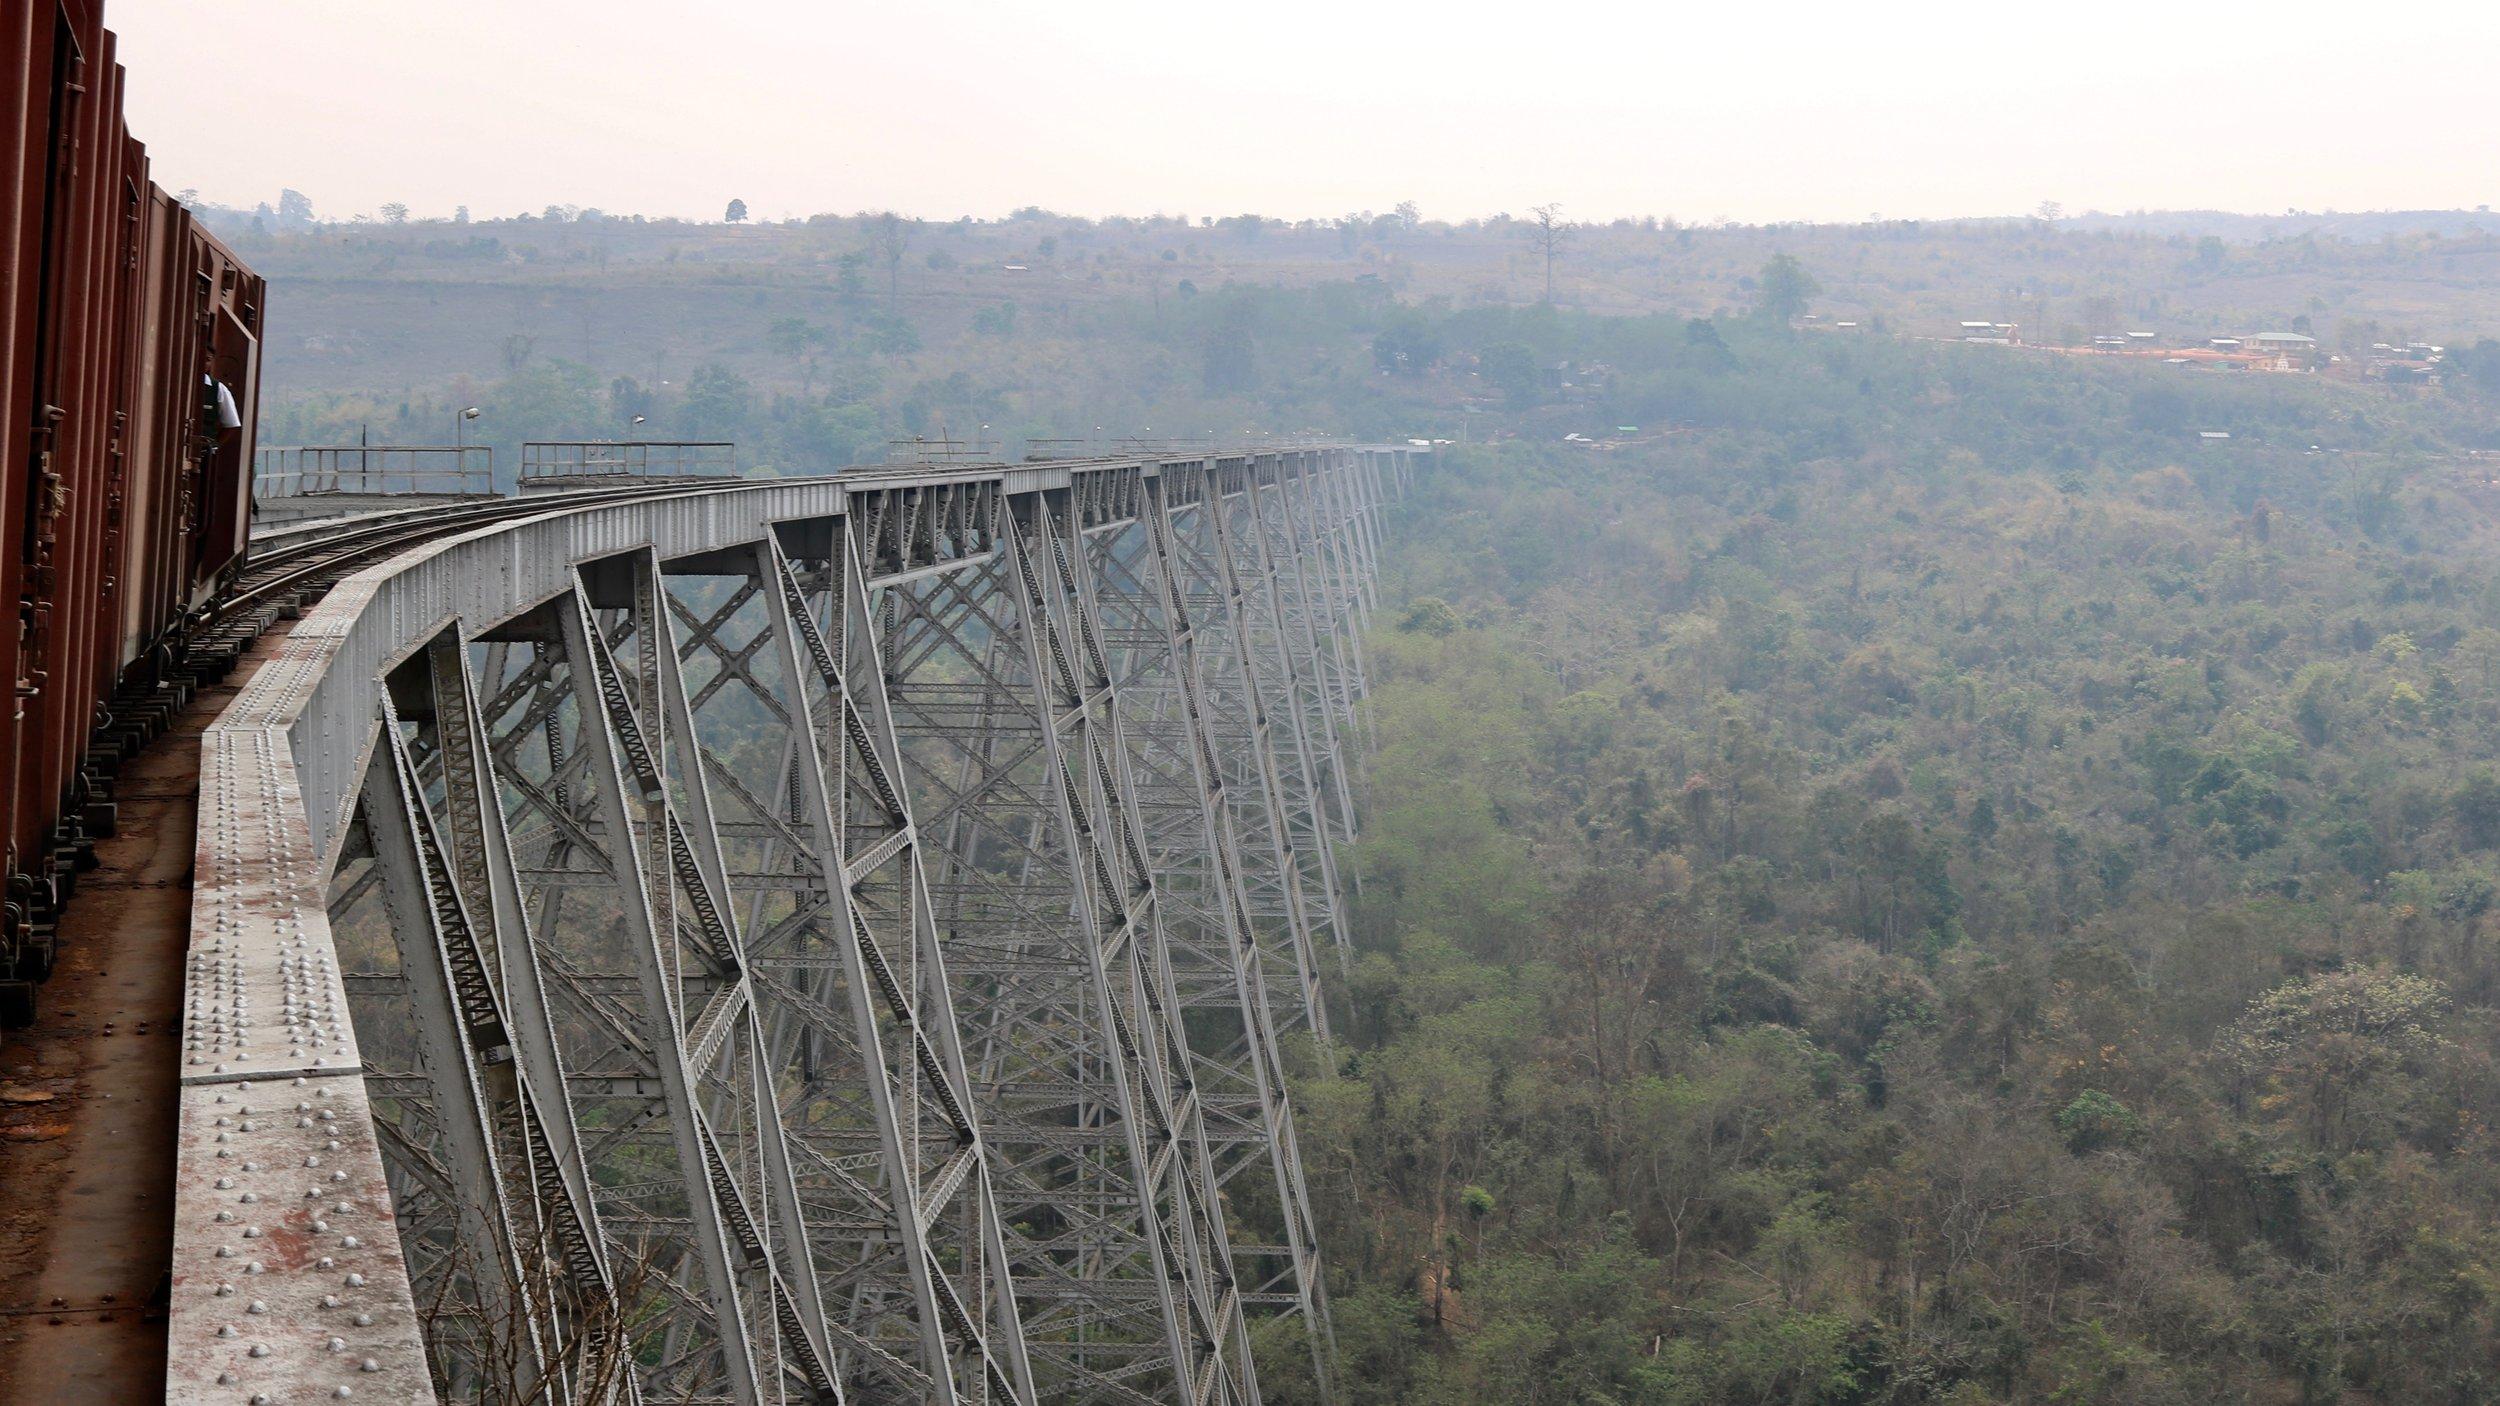 Train over the Goteik viaduct, Mandalay to Hsipaw, Myanmar @acrosslandsea